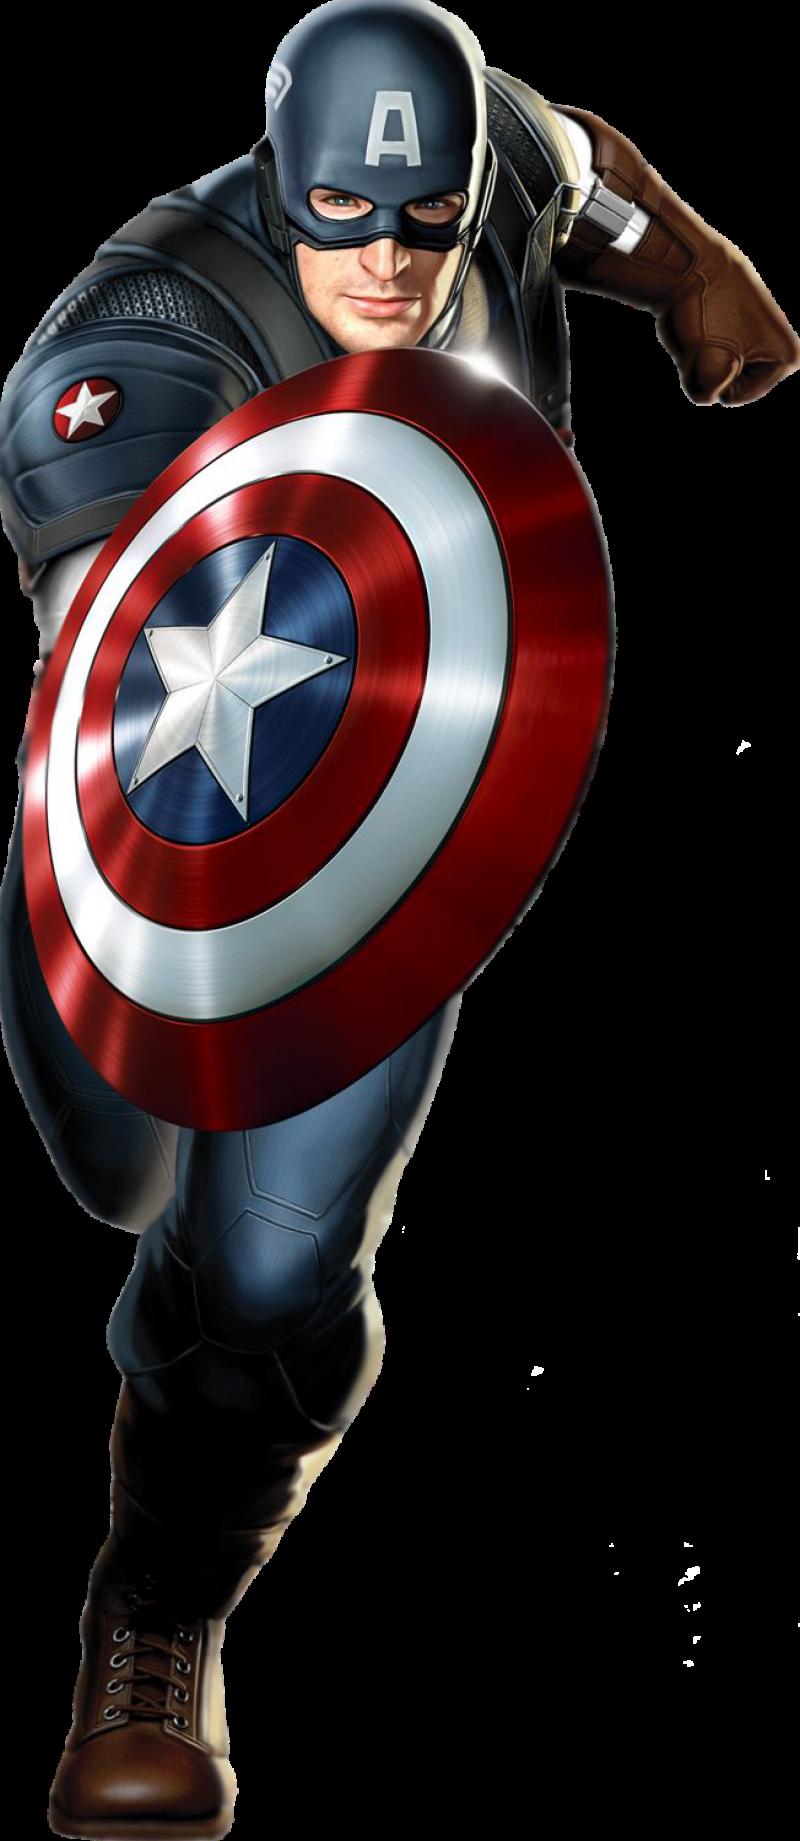 Captain America Png Image Captain America Wallpaper Captain America Images Captain America Pictures